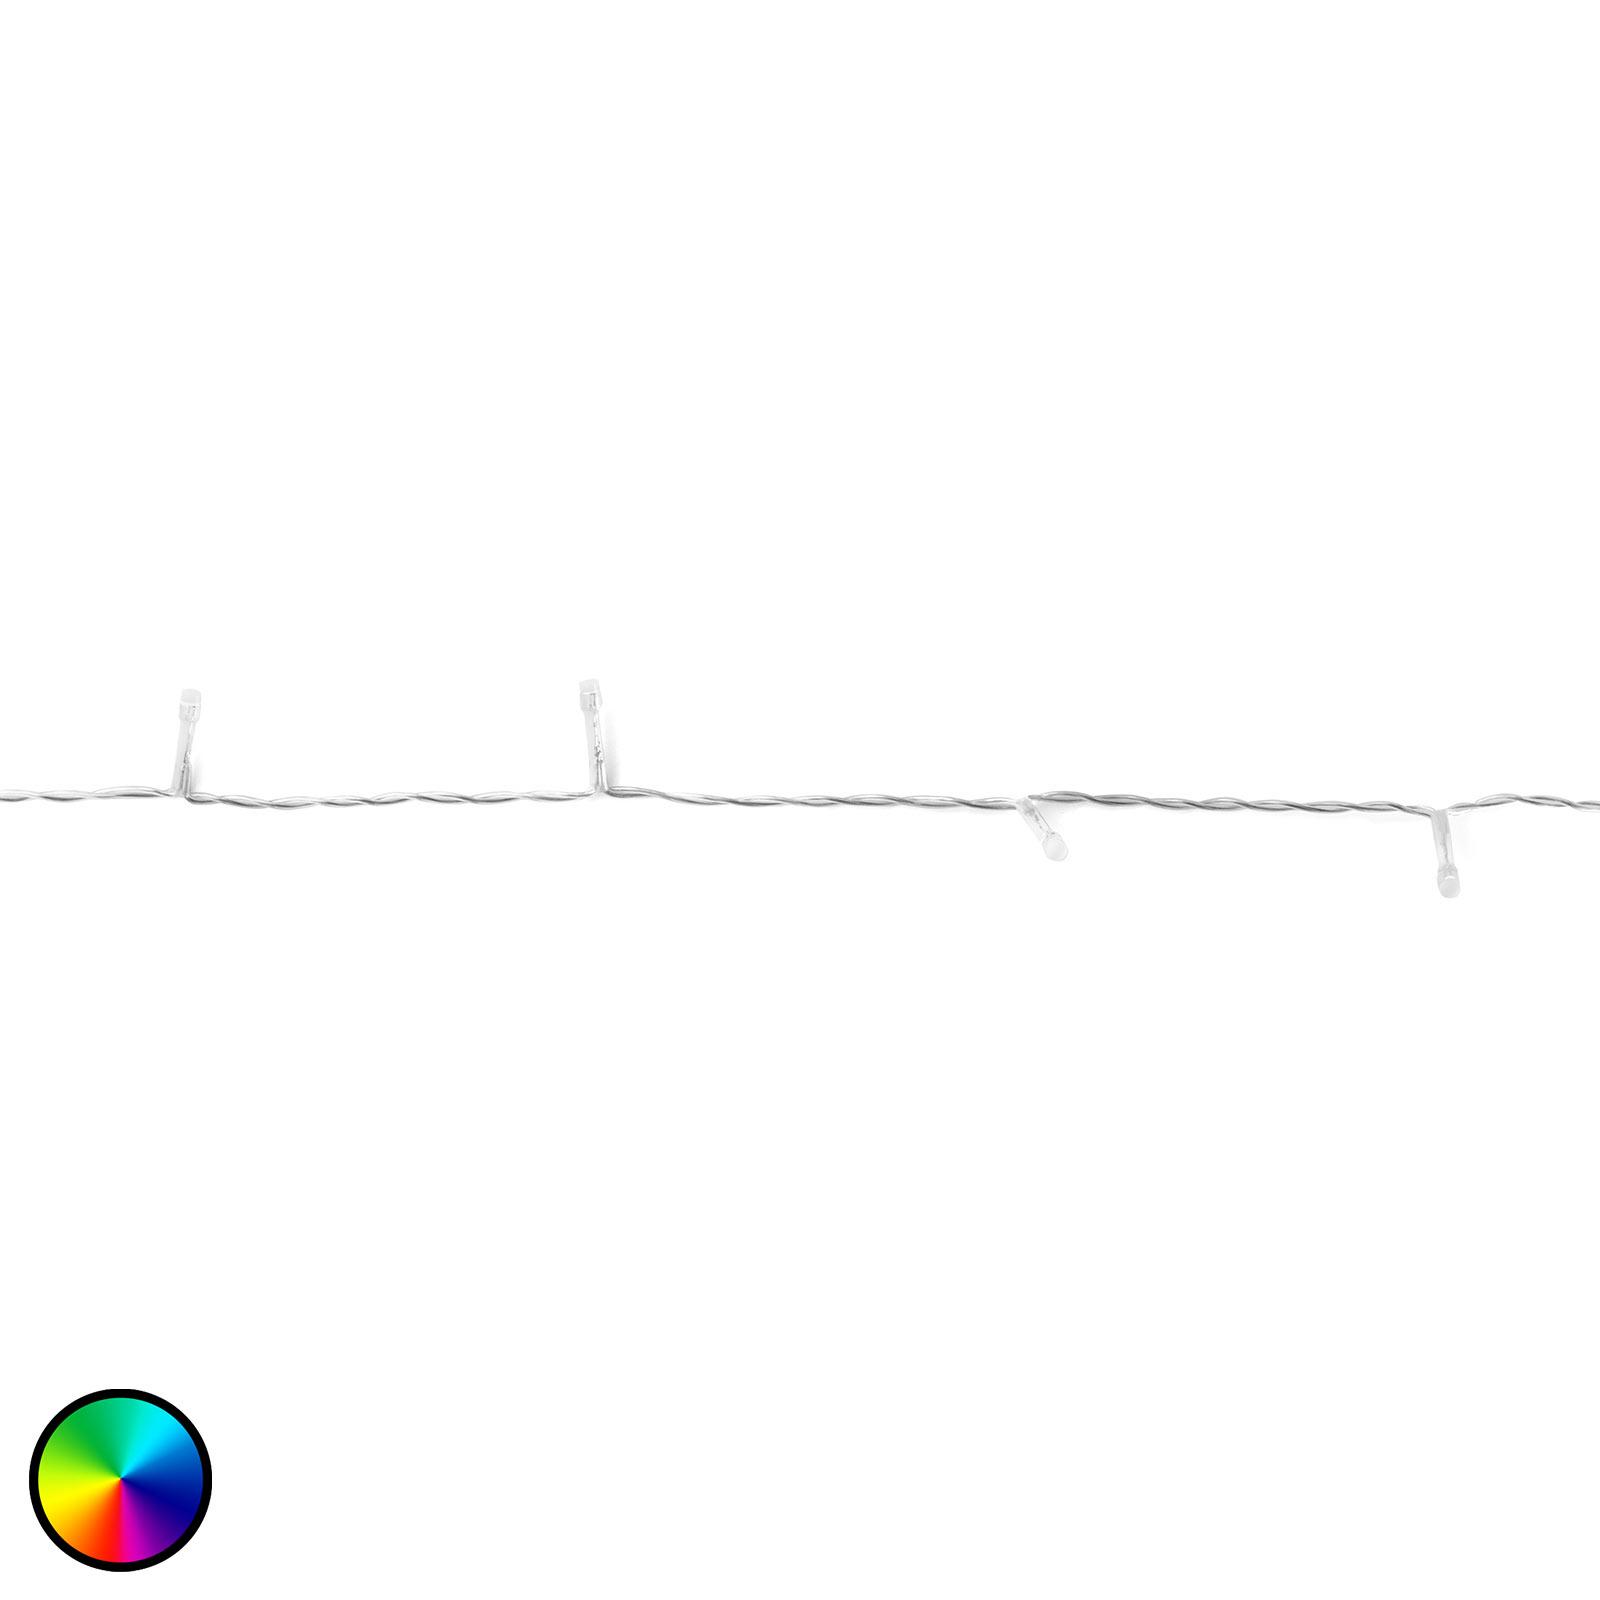 Lyslenke Twinkly RGBW, 250 lk 20m, transparent